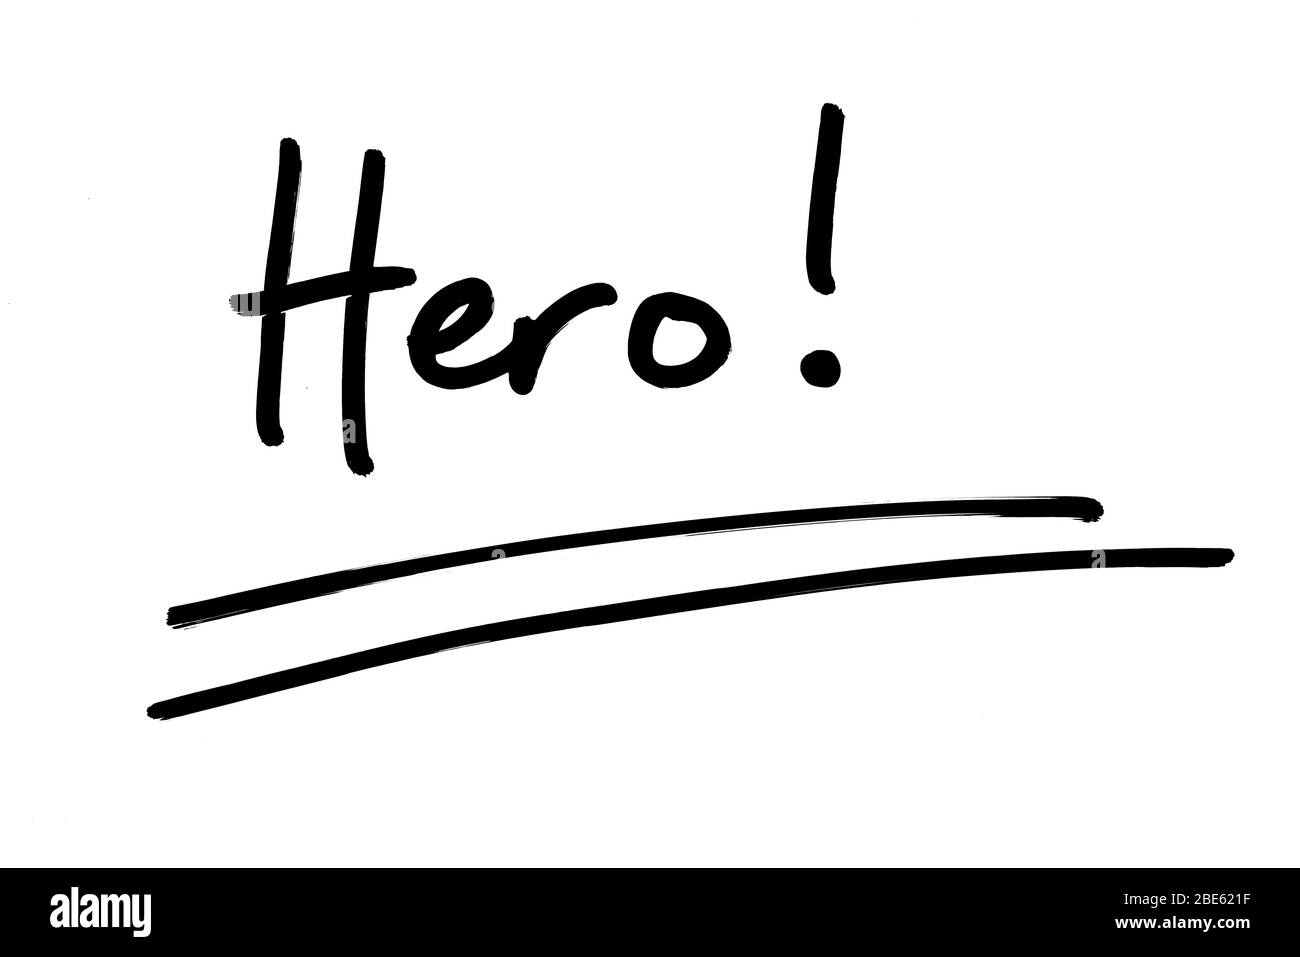 Hero! handwritten on a white background. Stock Photo